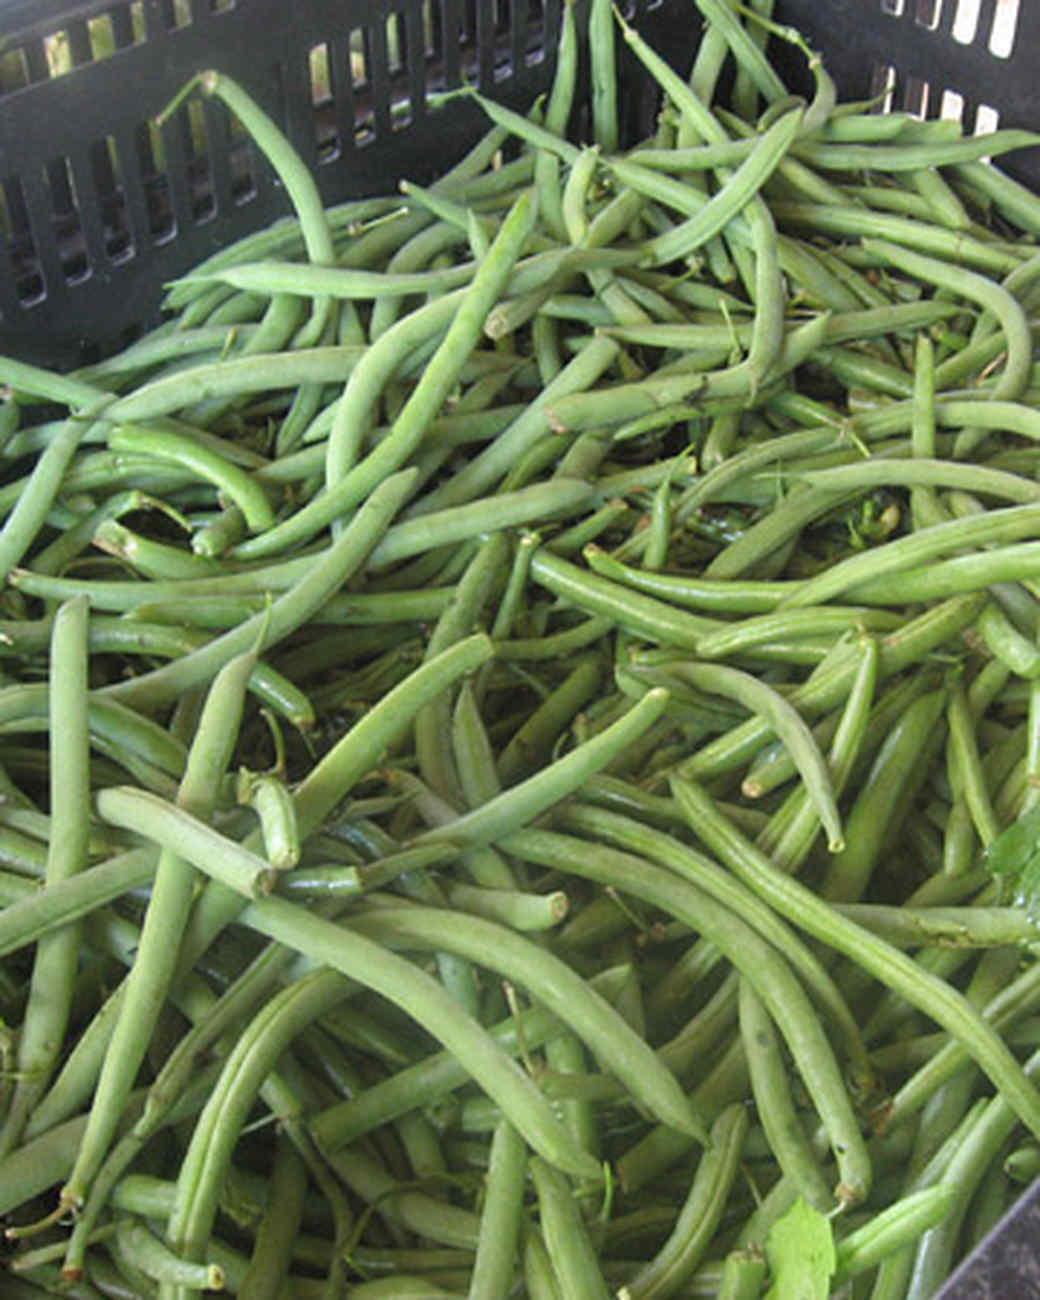 edfblg_082608_greenbeans.jpg